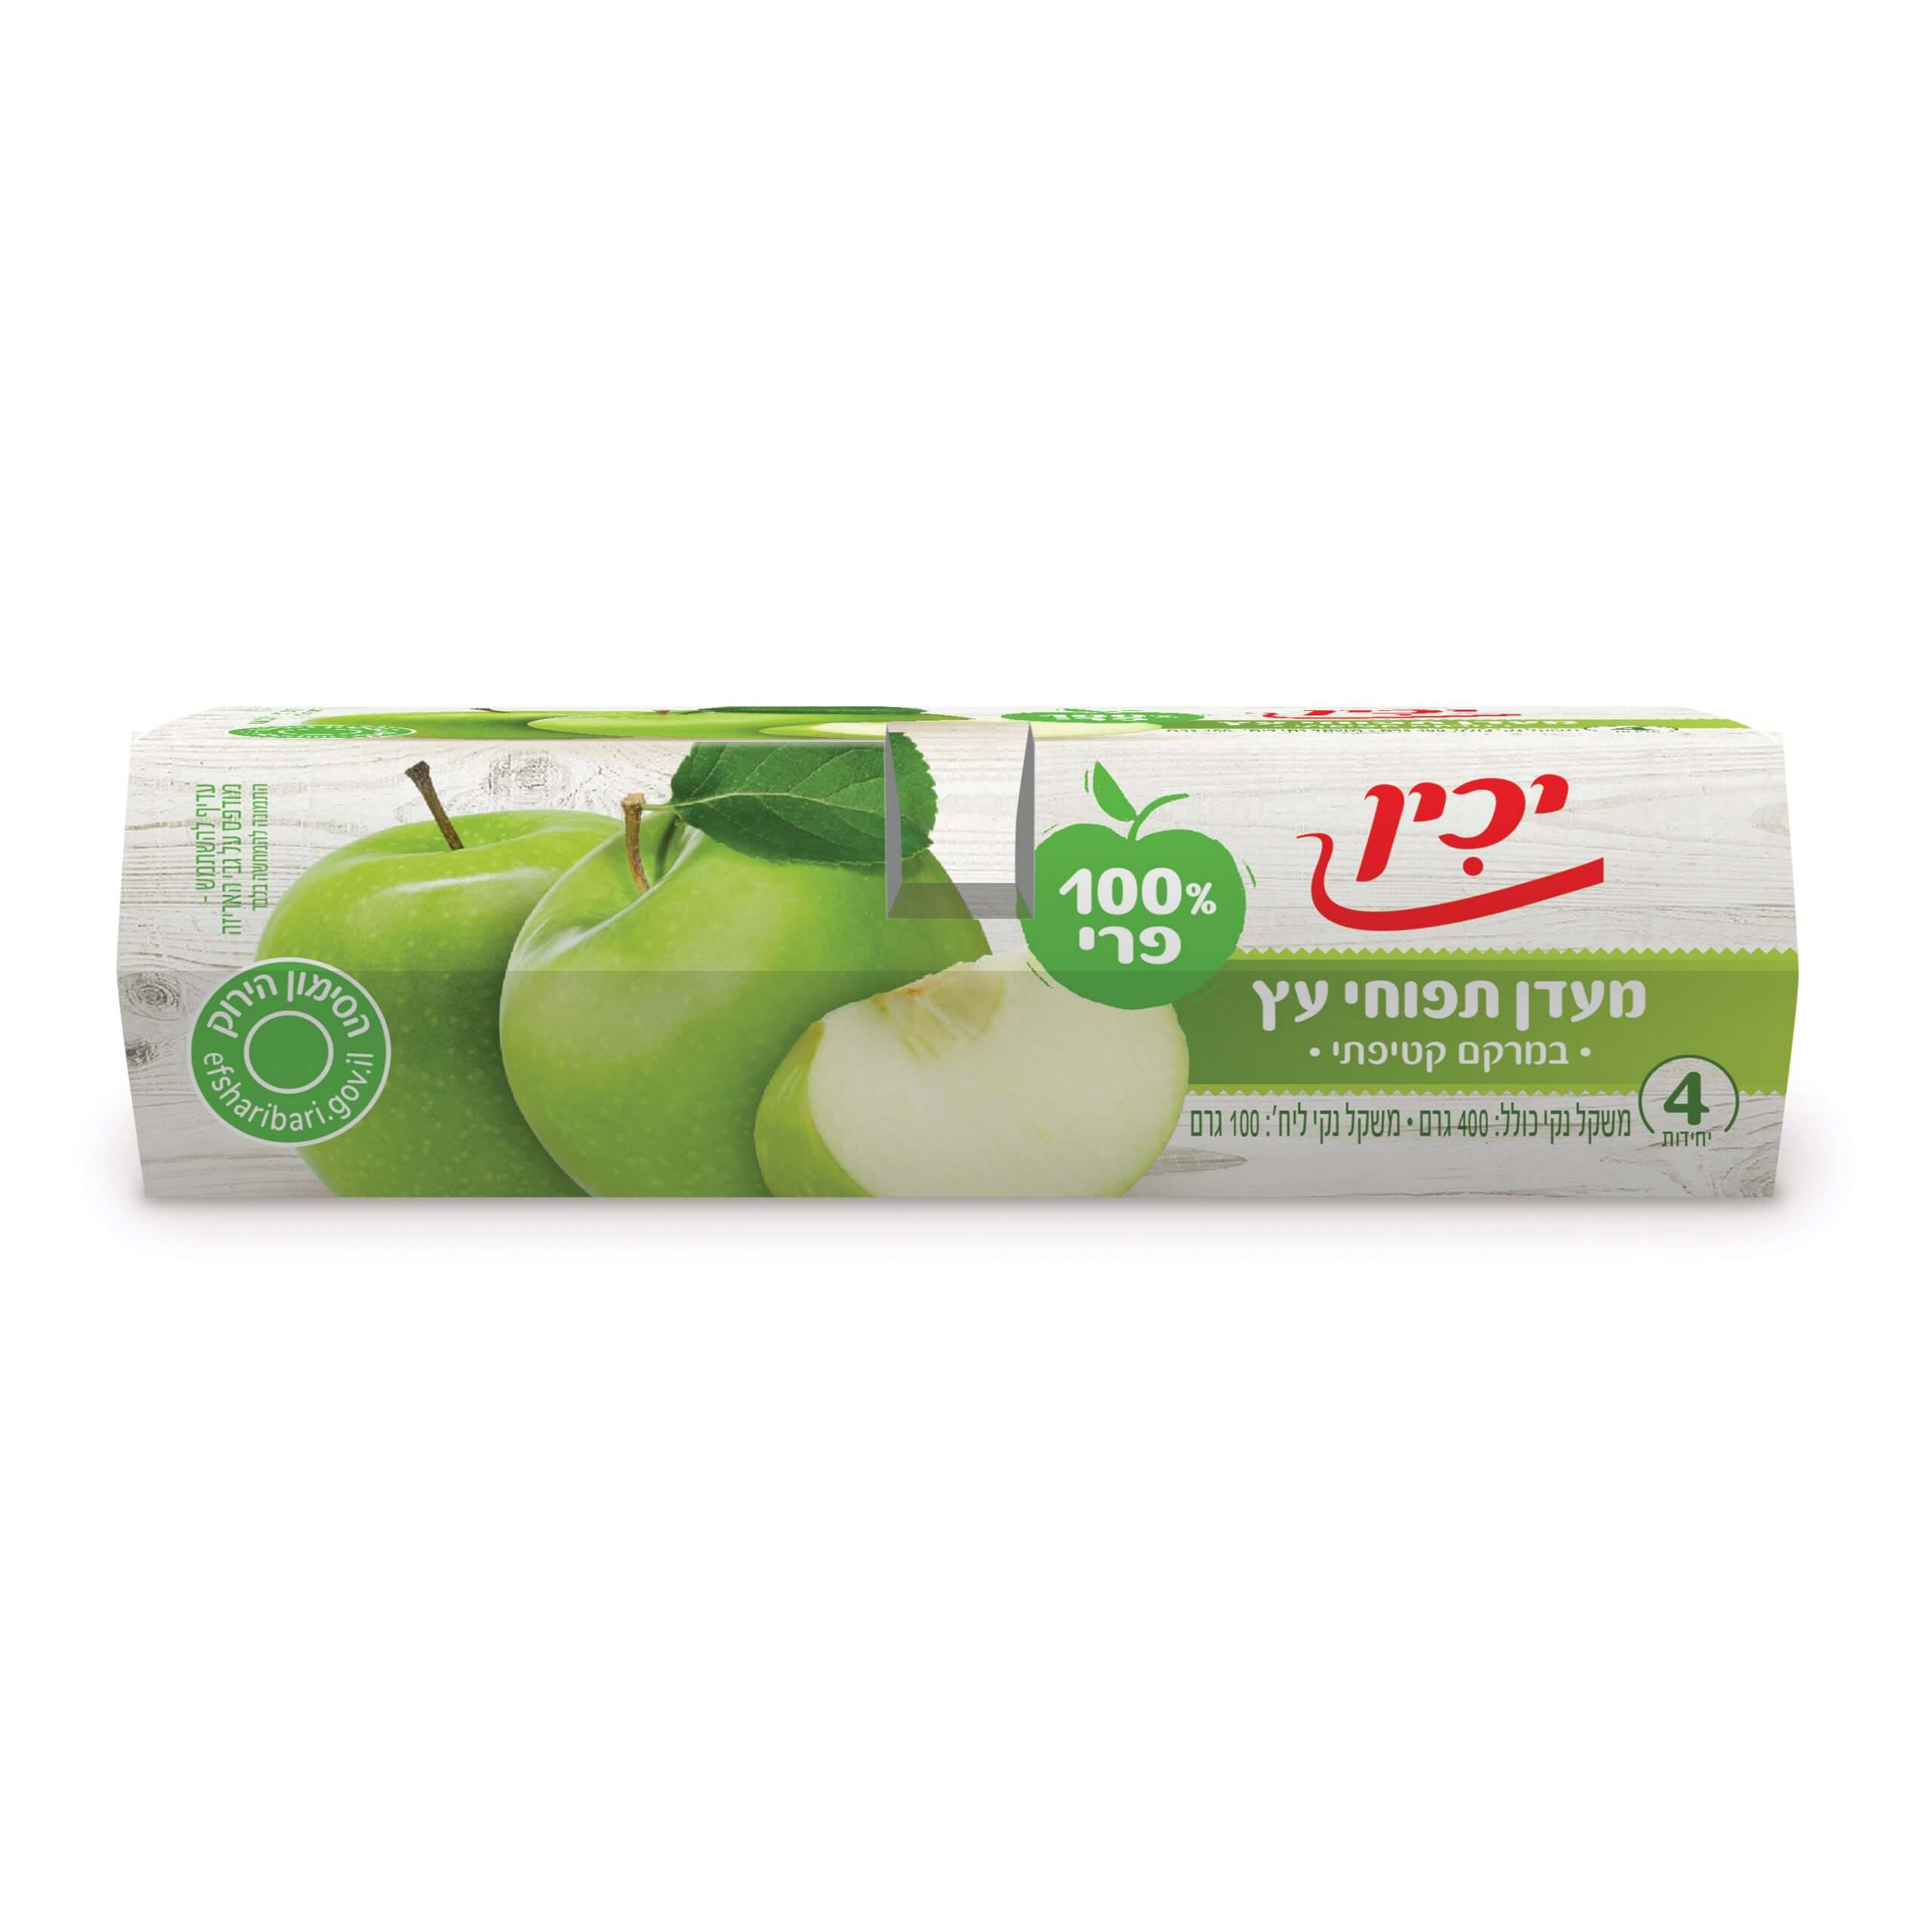 מעדן תפוחי עץ 100% פרי יכין 100גר מארז 4 יח'